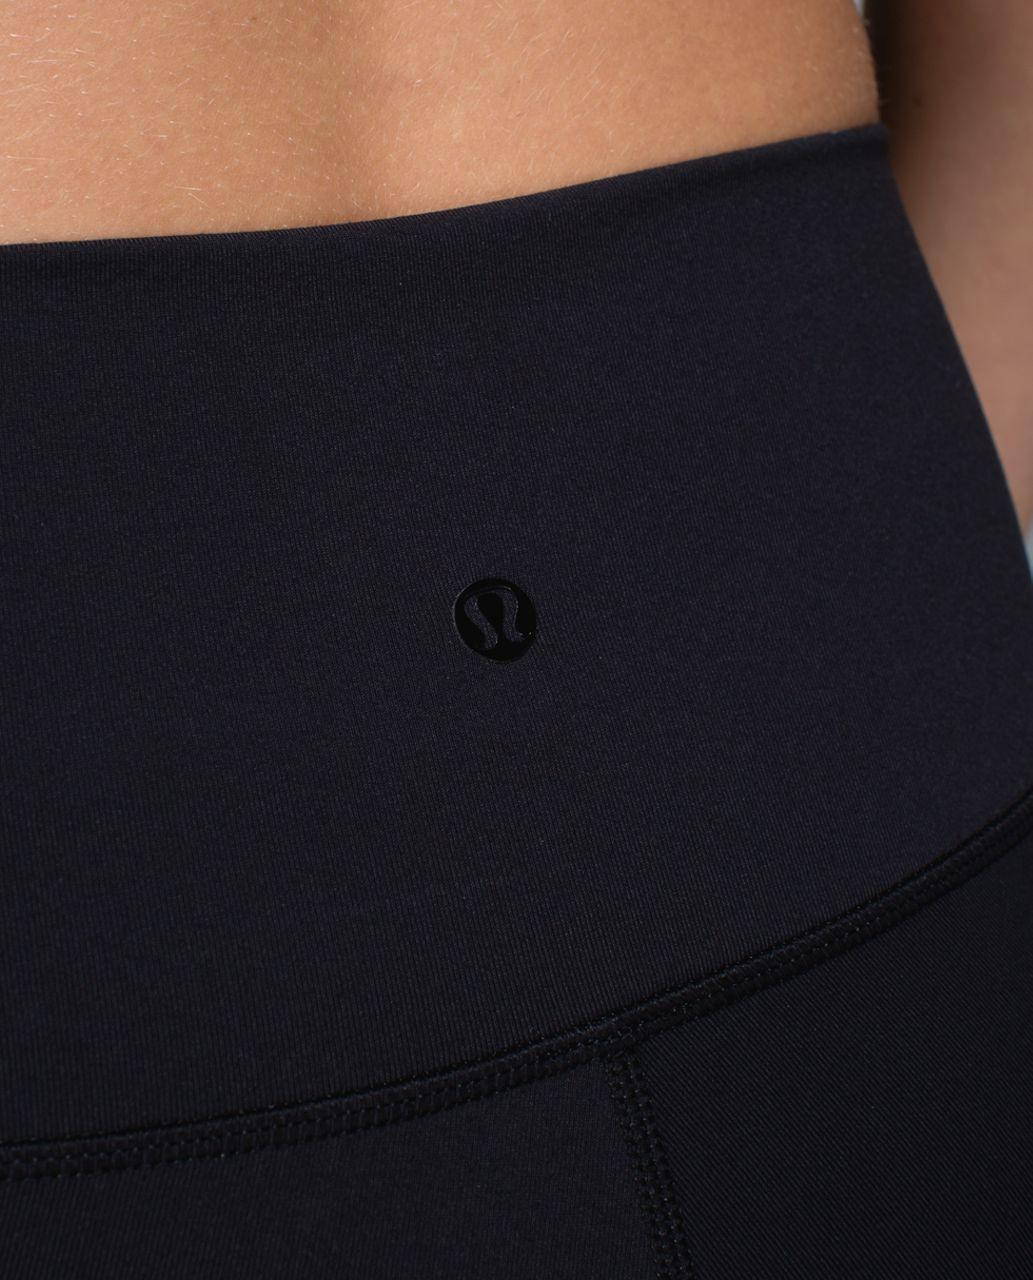 Lululemon High Times Pant *Full-On Luon - Black